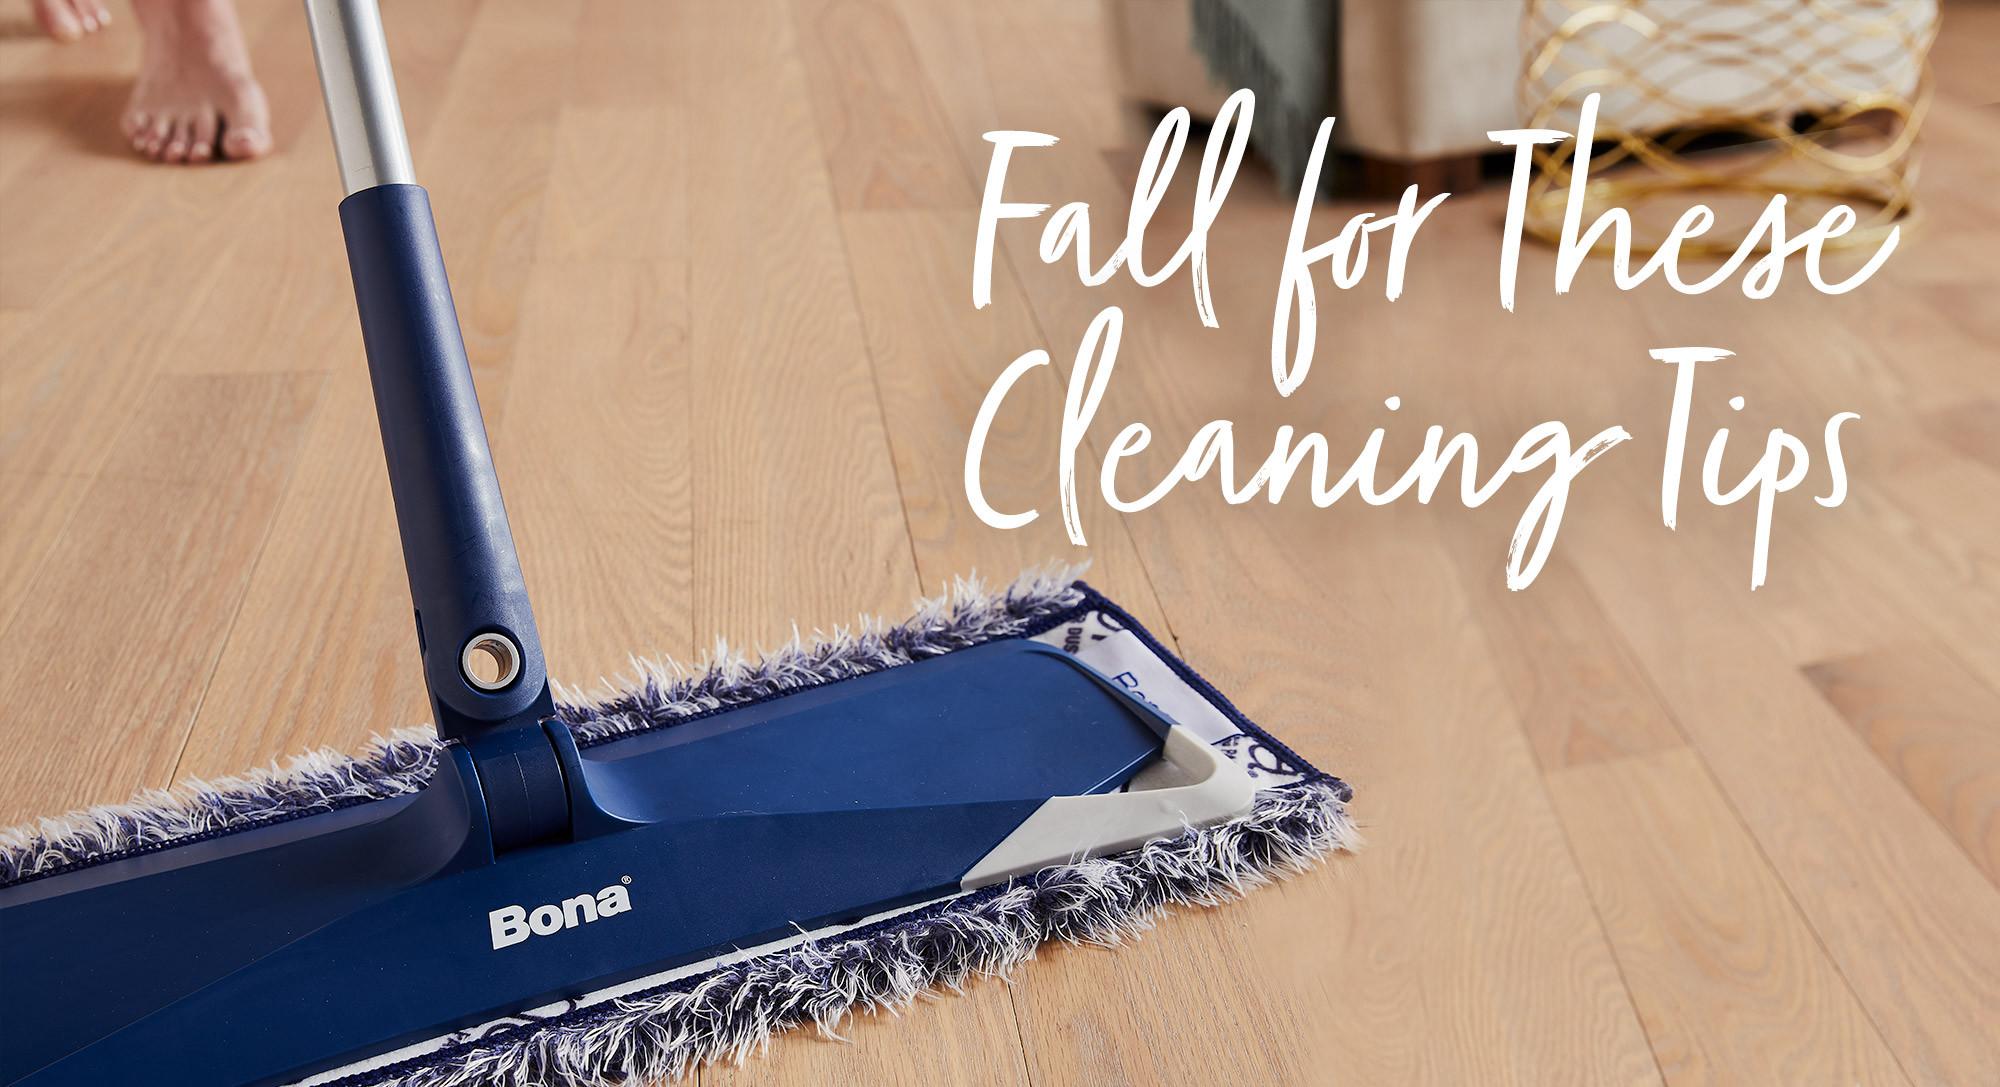 hardwood floors under carpet of home bona us regarding fall feature2